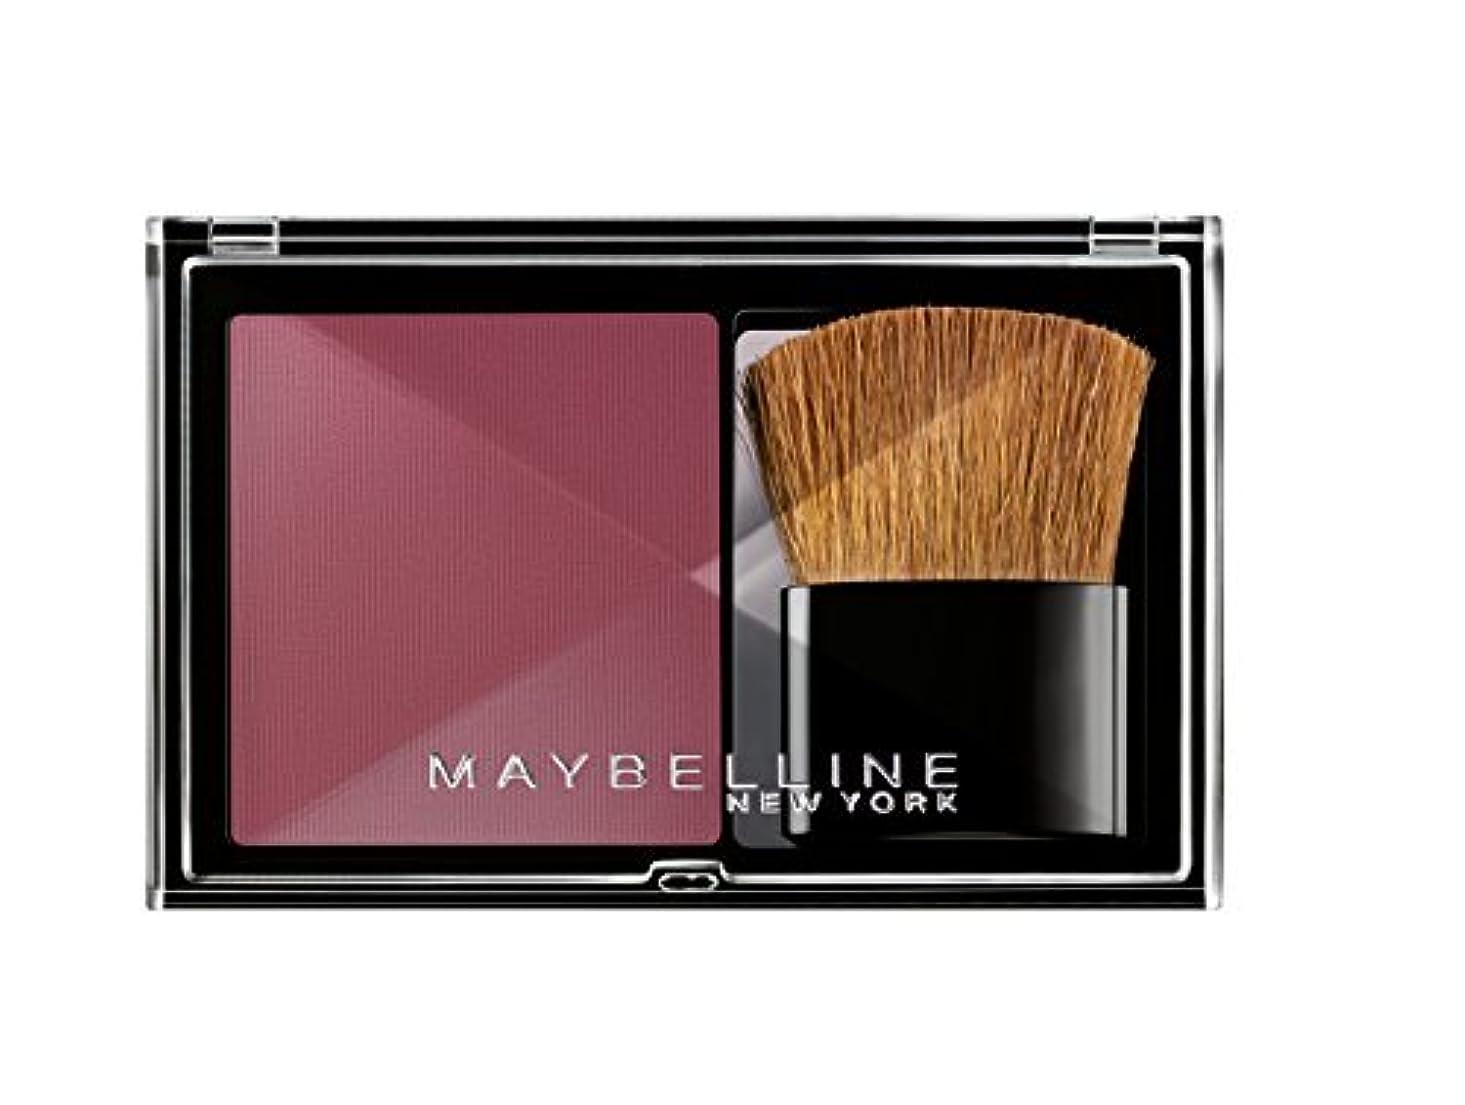 変形再生可能不愉快Maybelline Expertwear Blush - Flash Plum (Number 79) by Maybelline